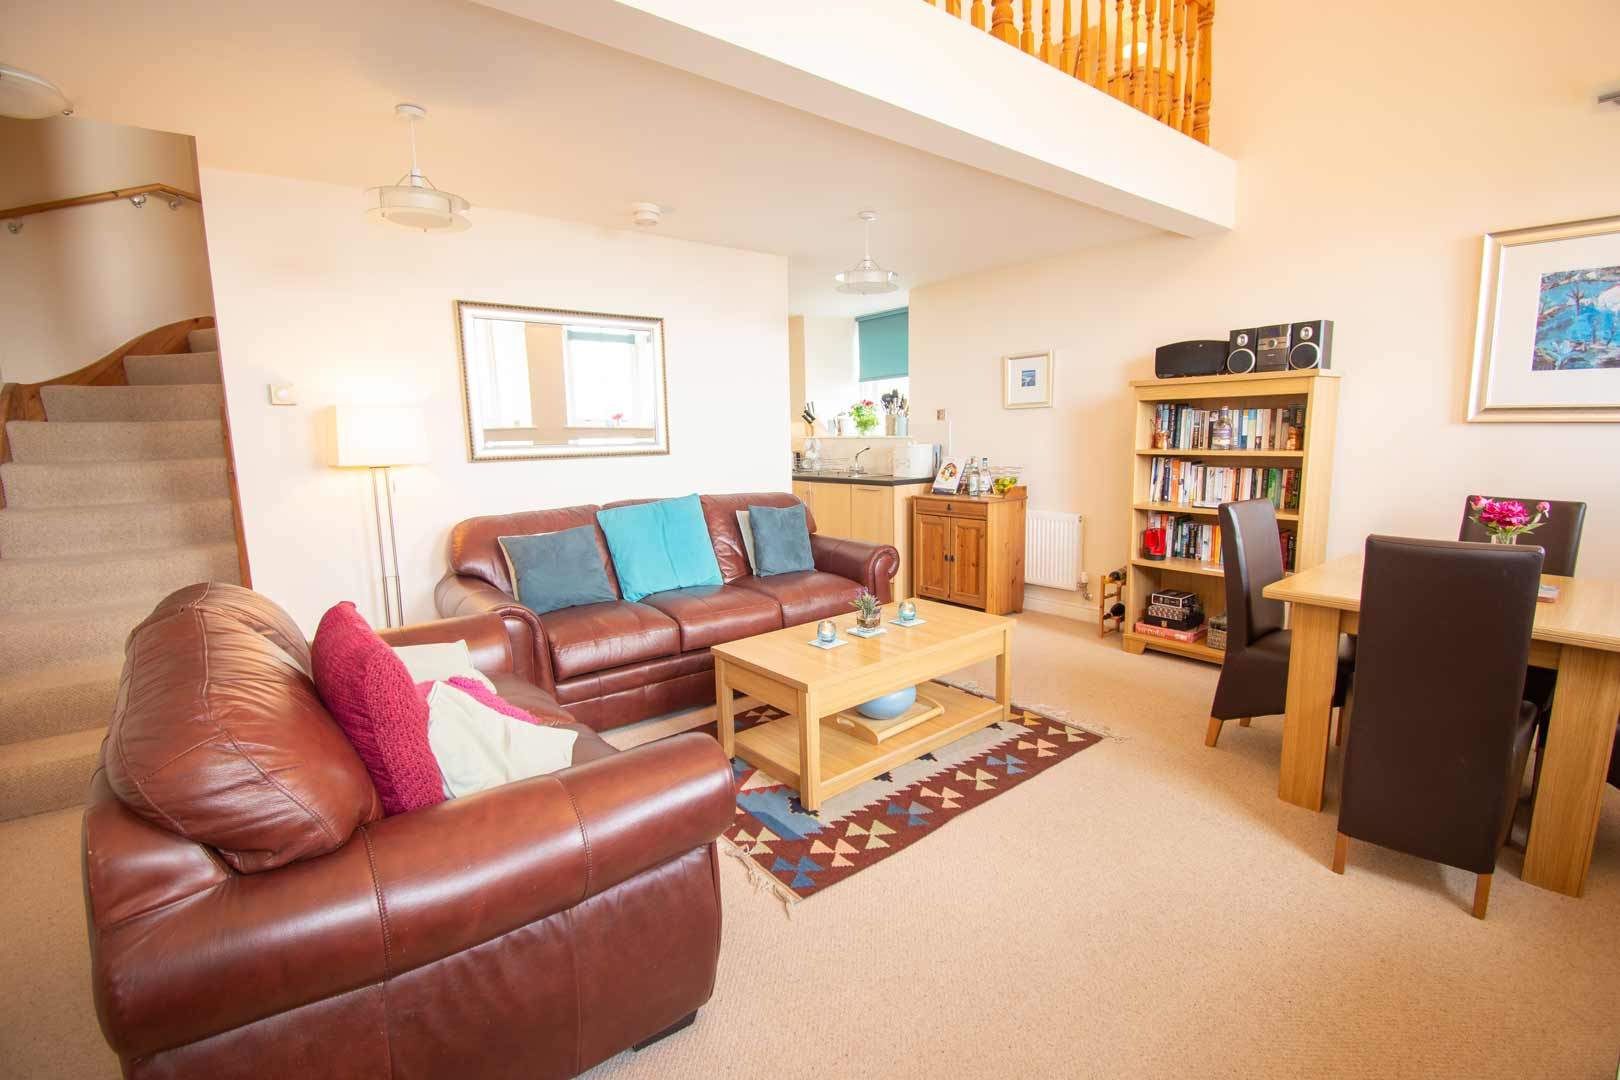 Kilchoman apartment: open plan living area